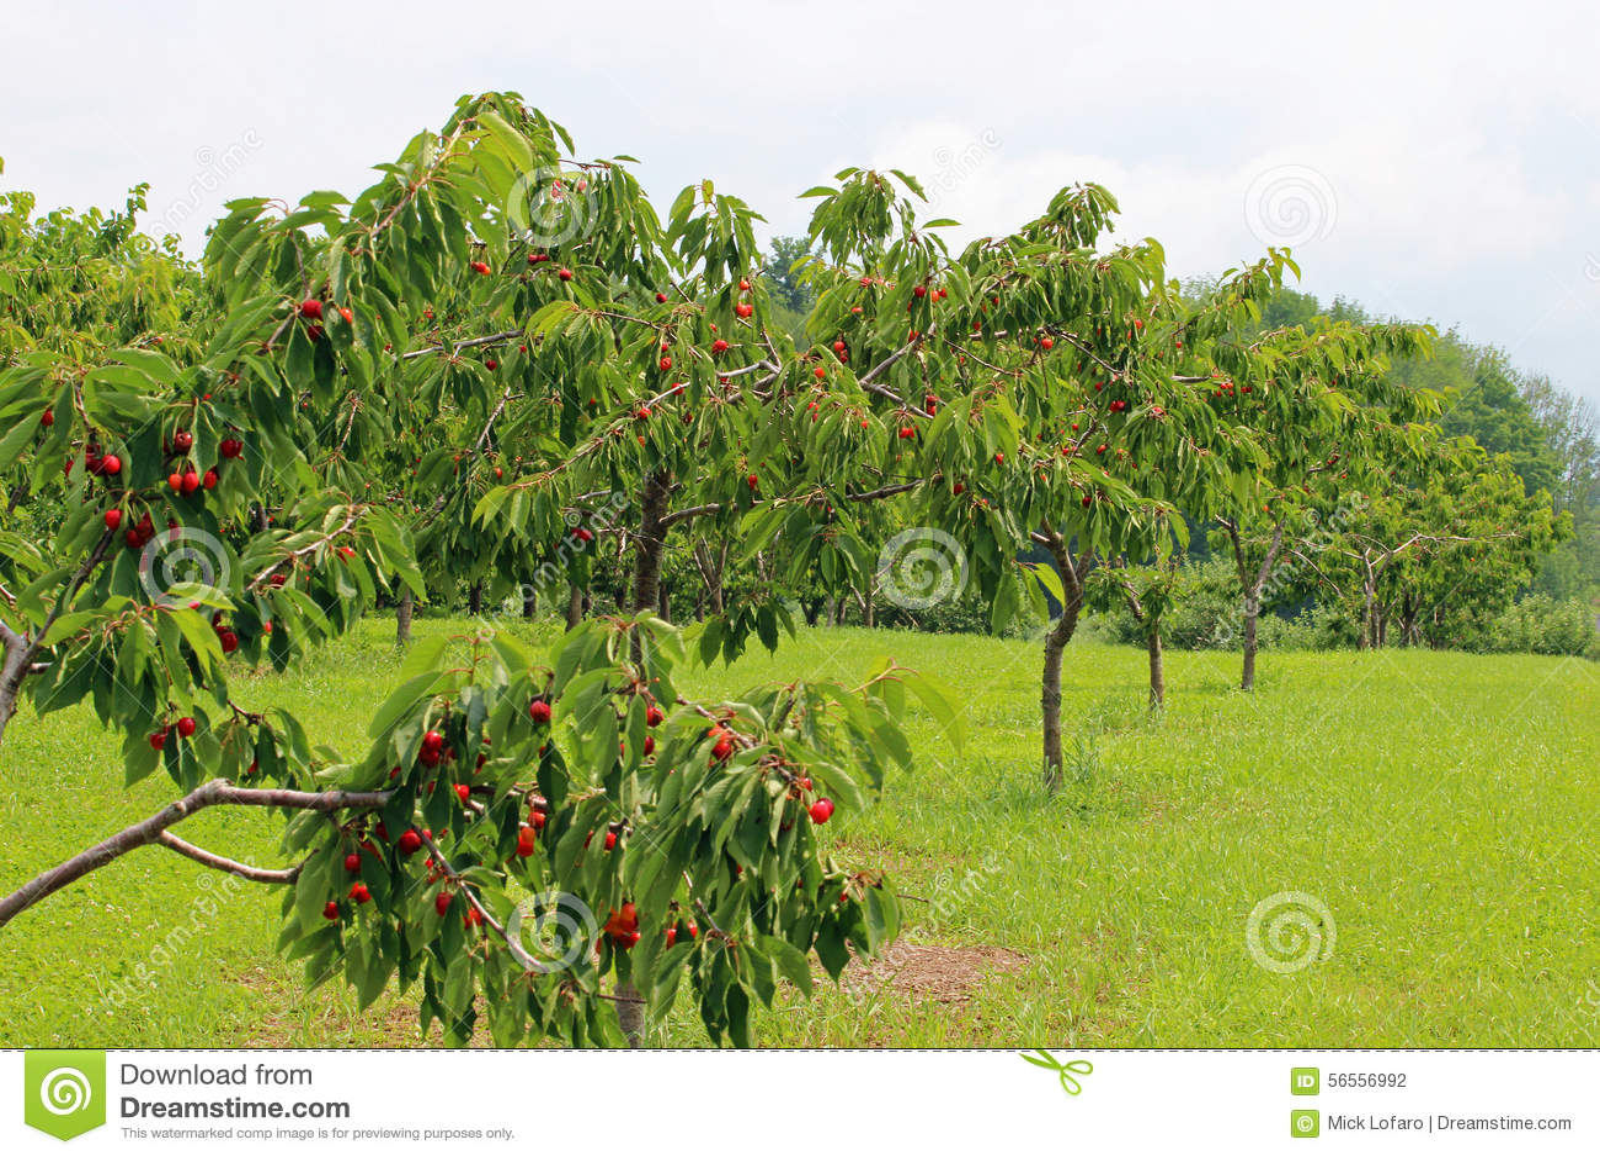 Download Δέντρα κερασιών στοκ εικόνες. εικόνα από άκρα, φύλλα - 56556992